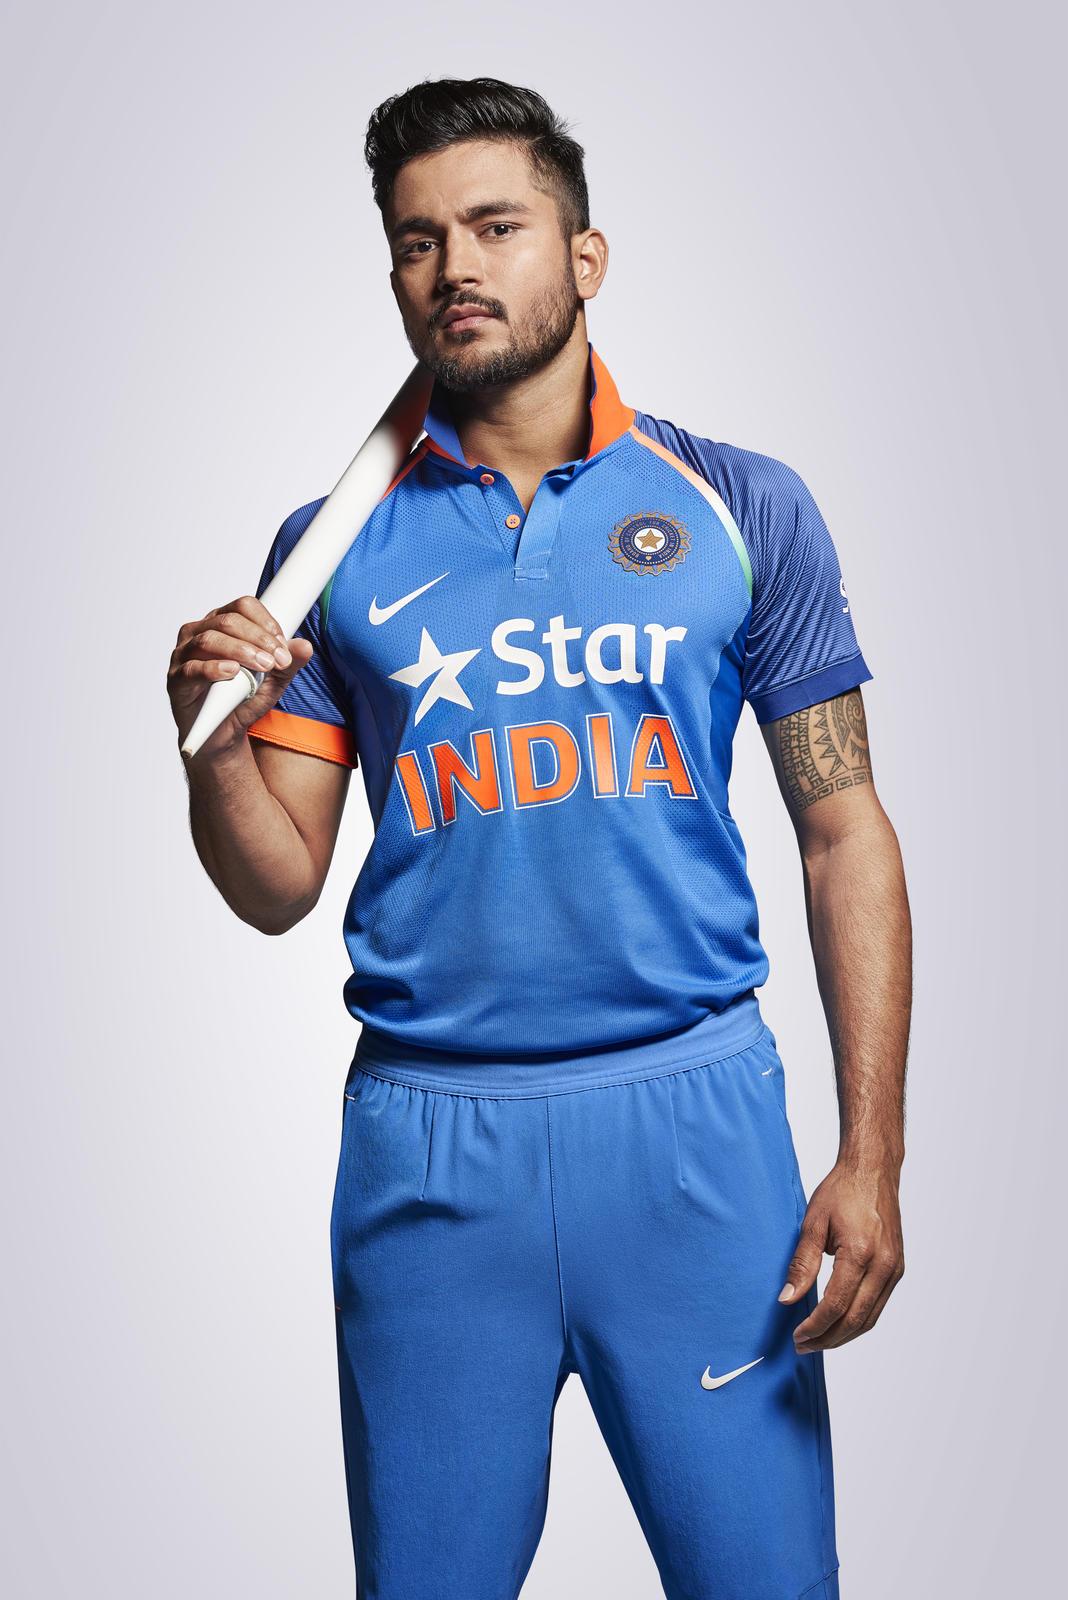 Nike Unveils New Team India Cricket Kit - Nike News